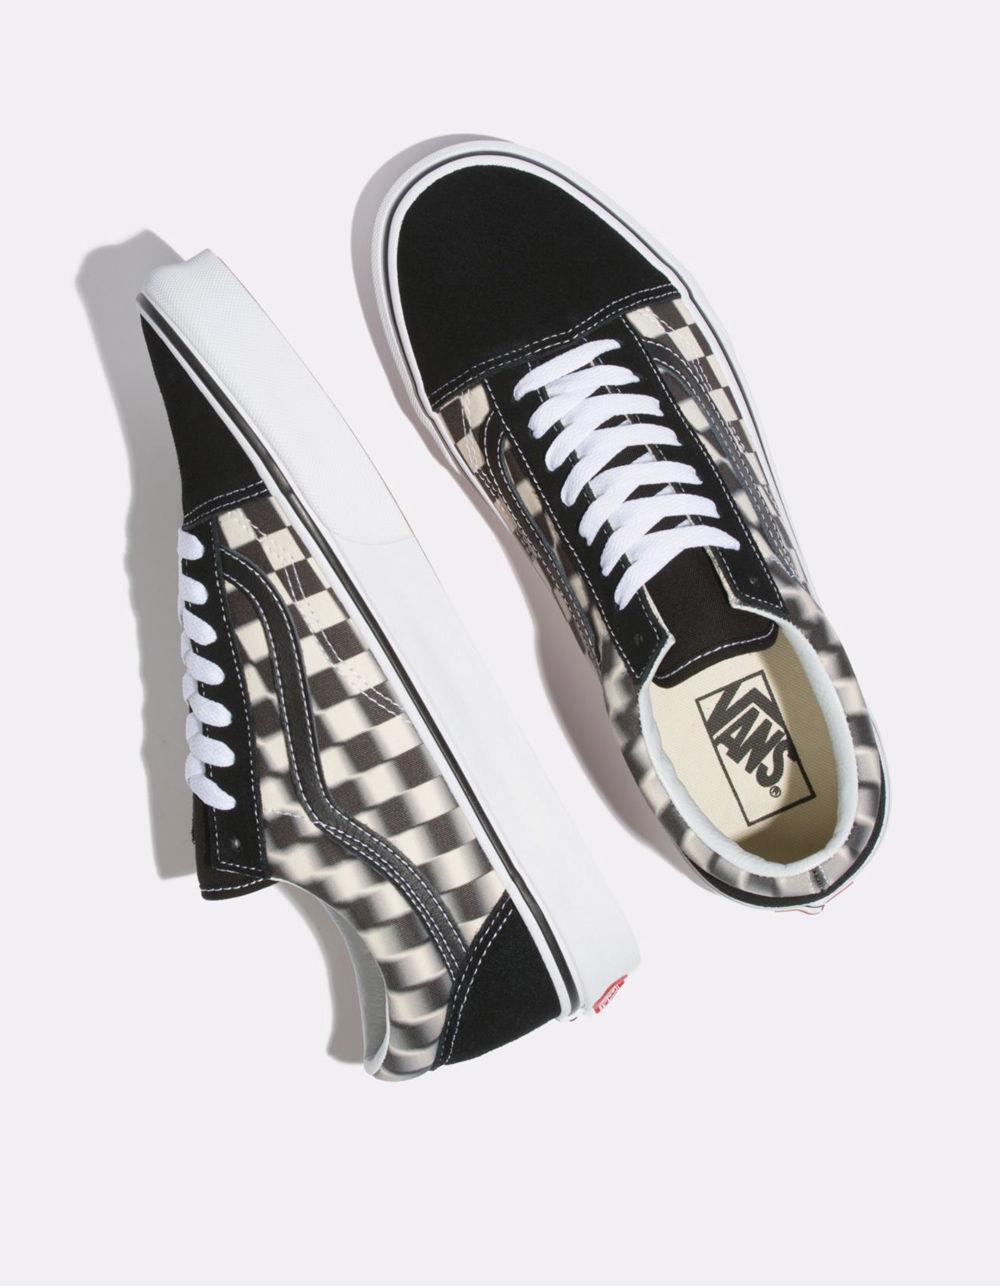 c787a080d9f Vans - Blur Check Old Skool Black   Classic White Shoes - Lyst. View  fullscreen